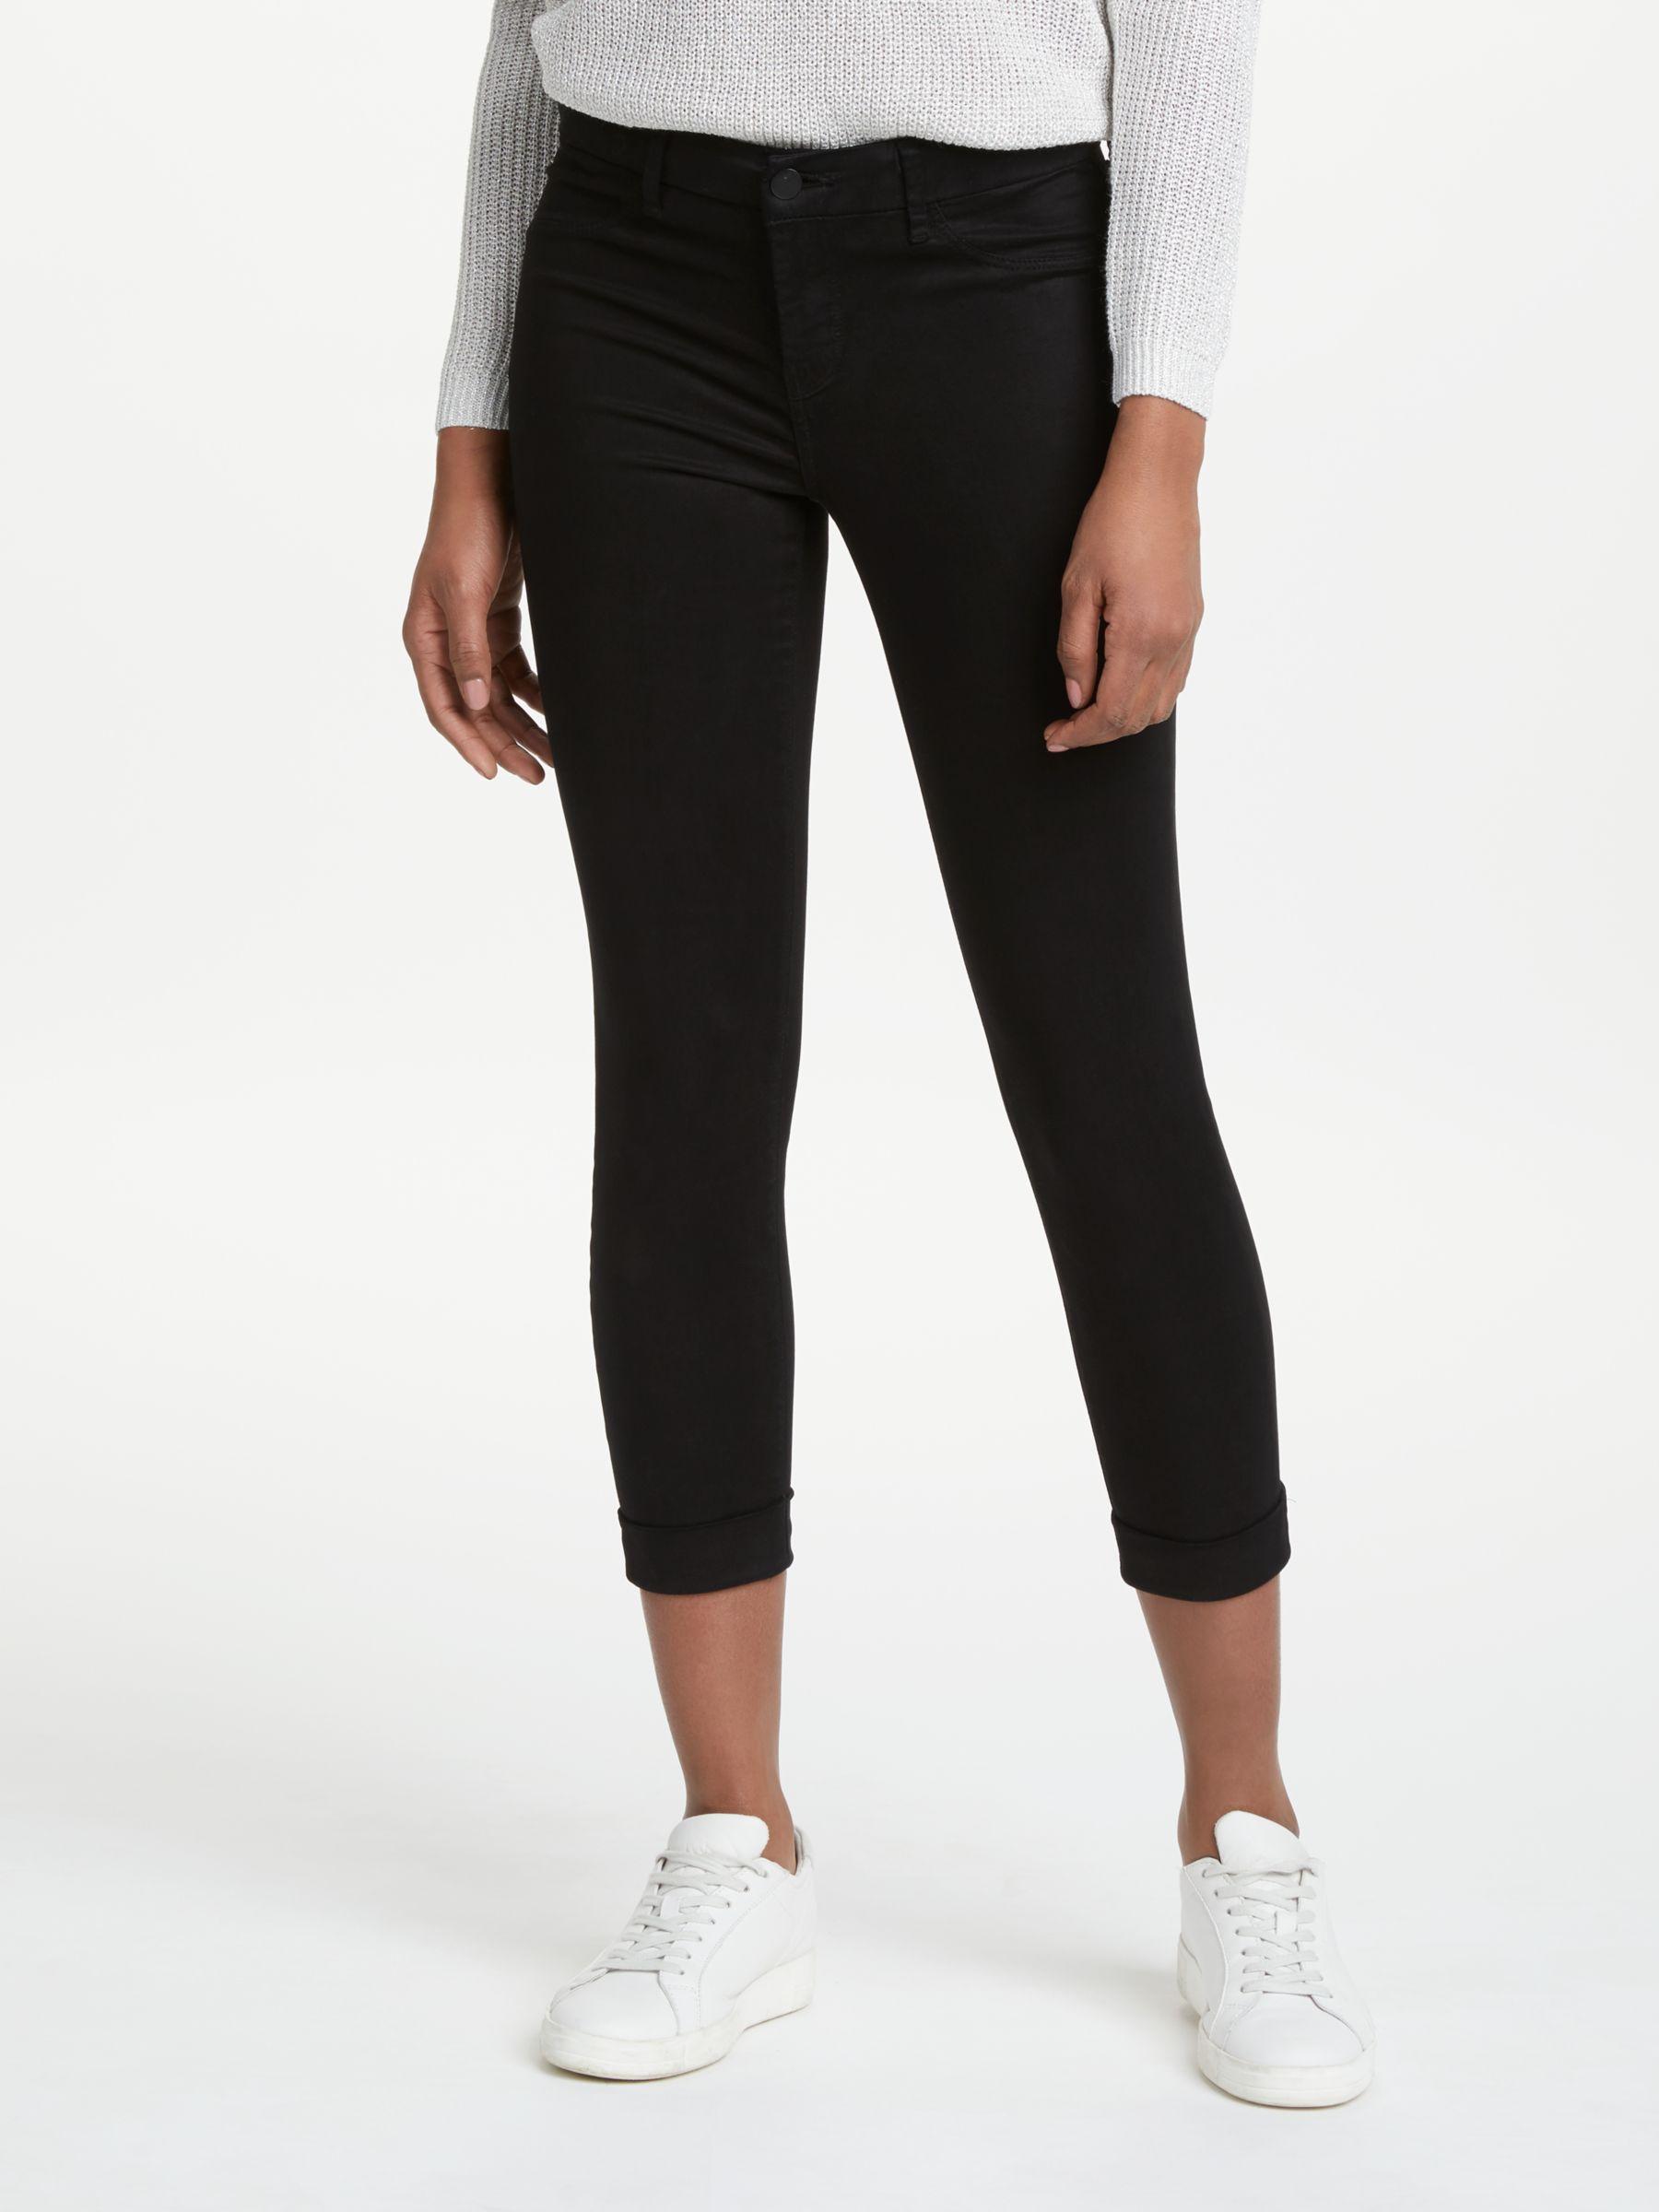 J Brand J Brand Anja Mid Rise Cropped Skinny Jeans, Black